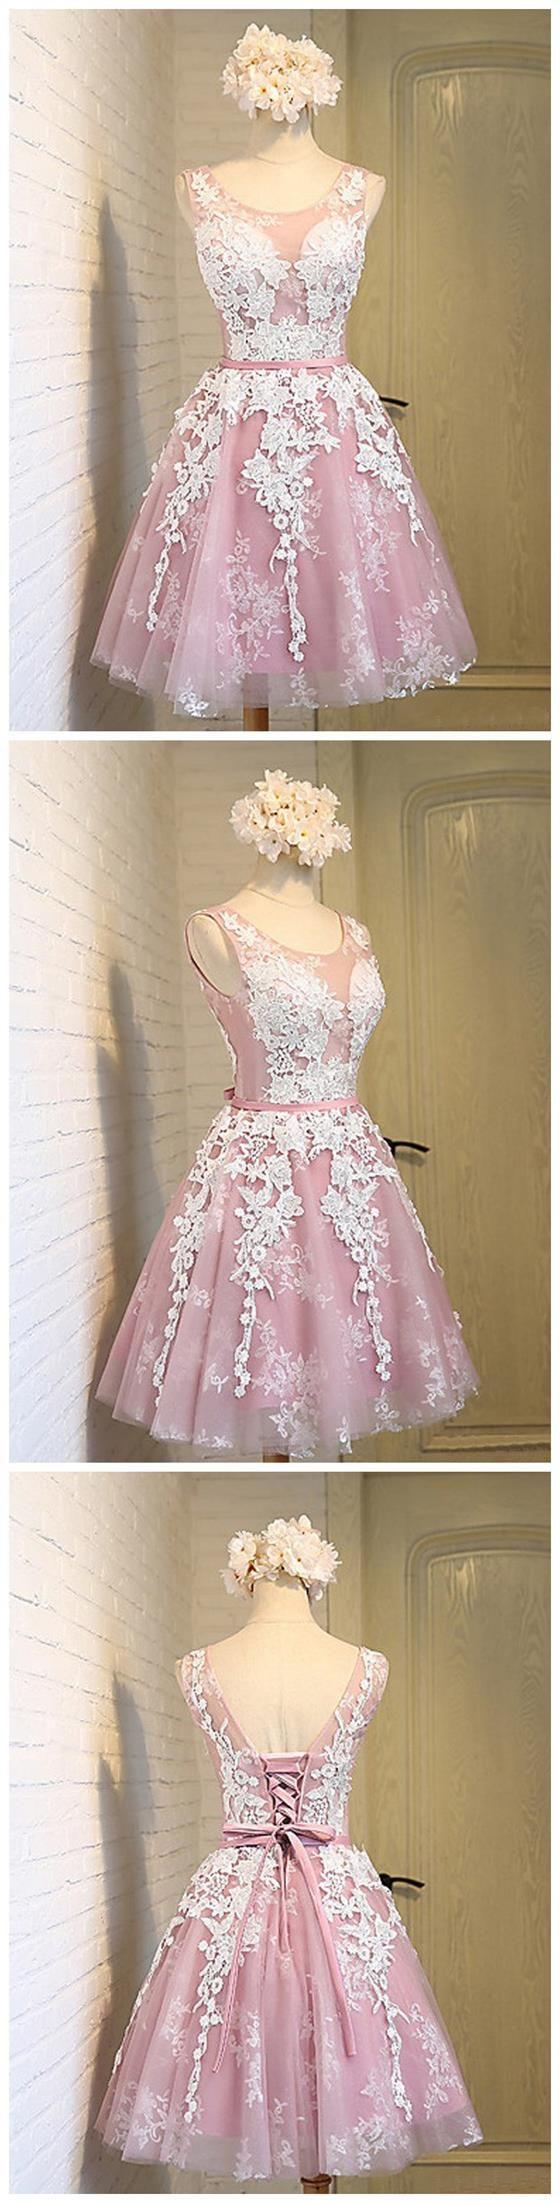 Pink Homecoming Dress,Pretty Homeco